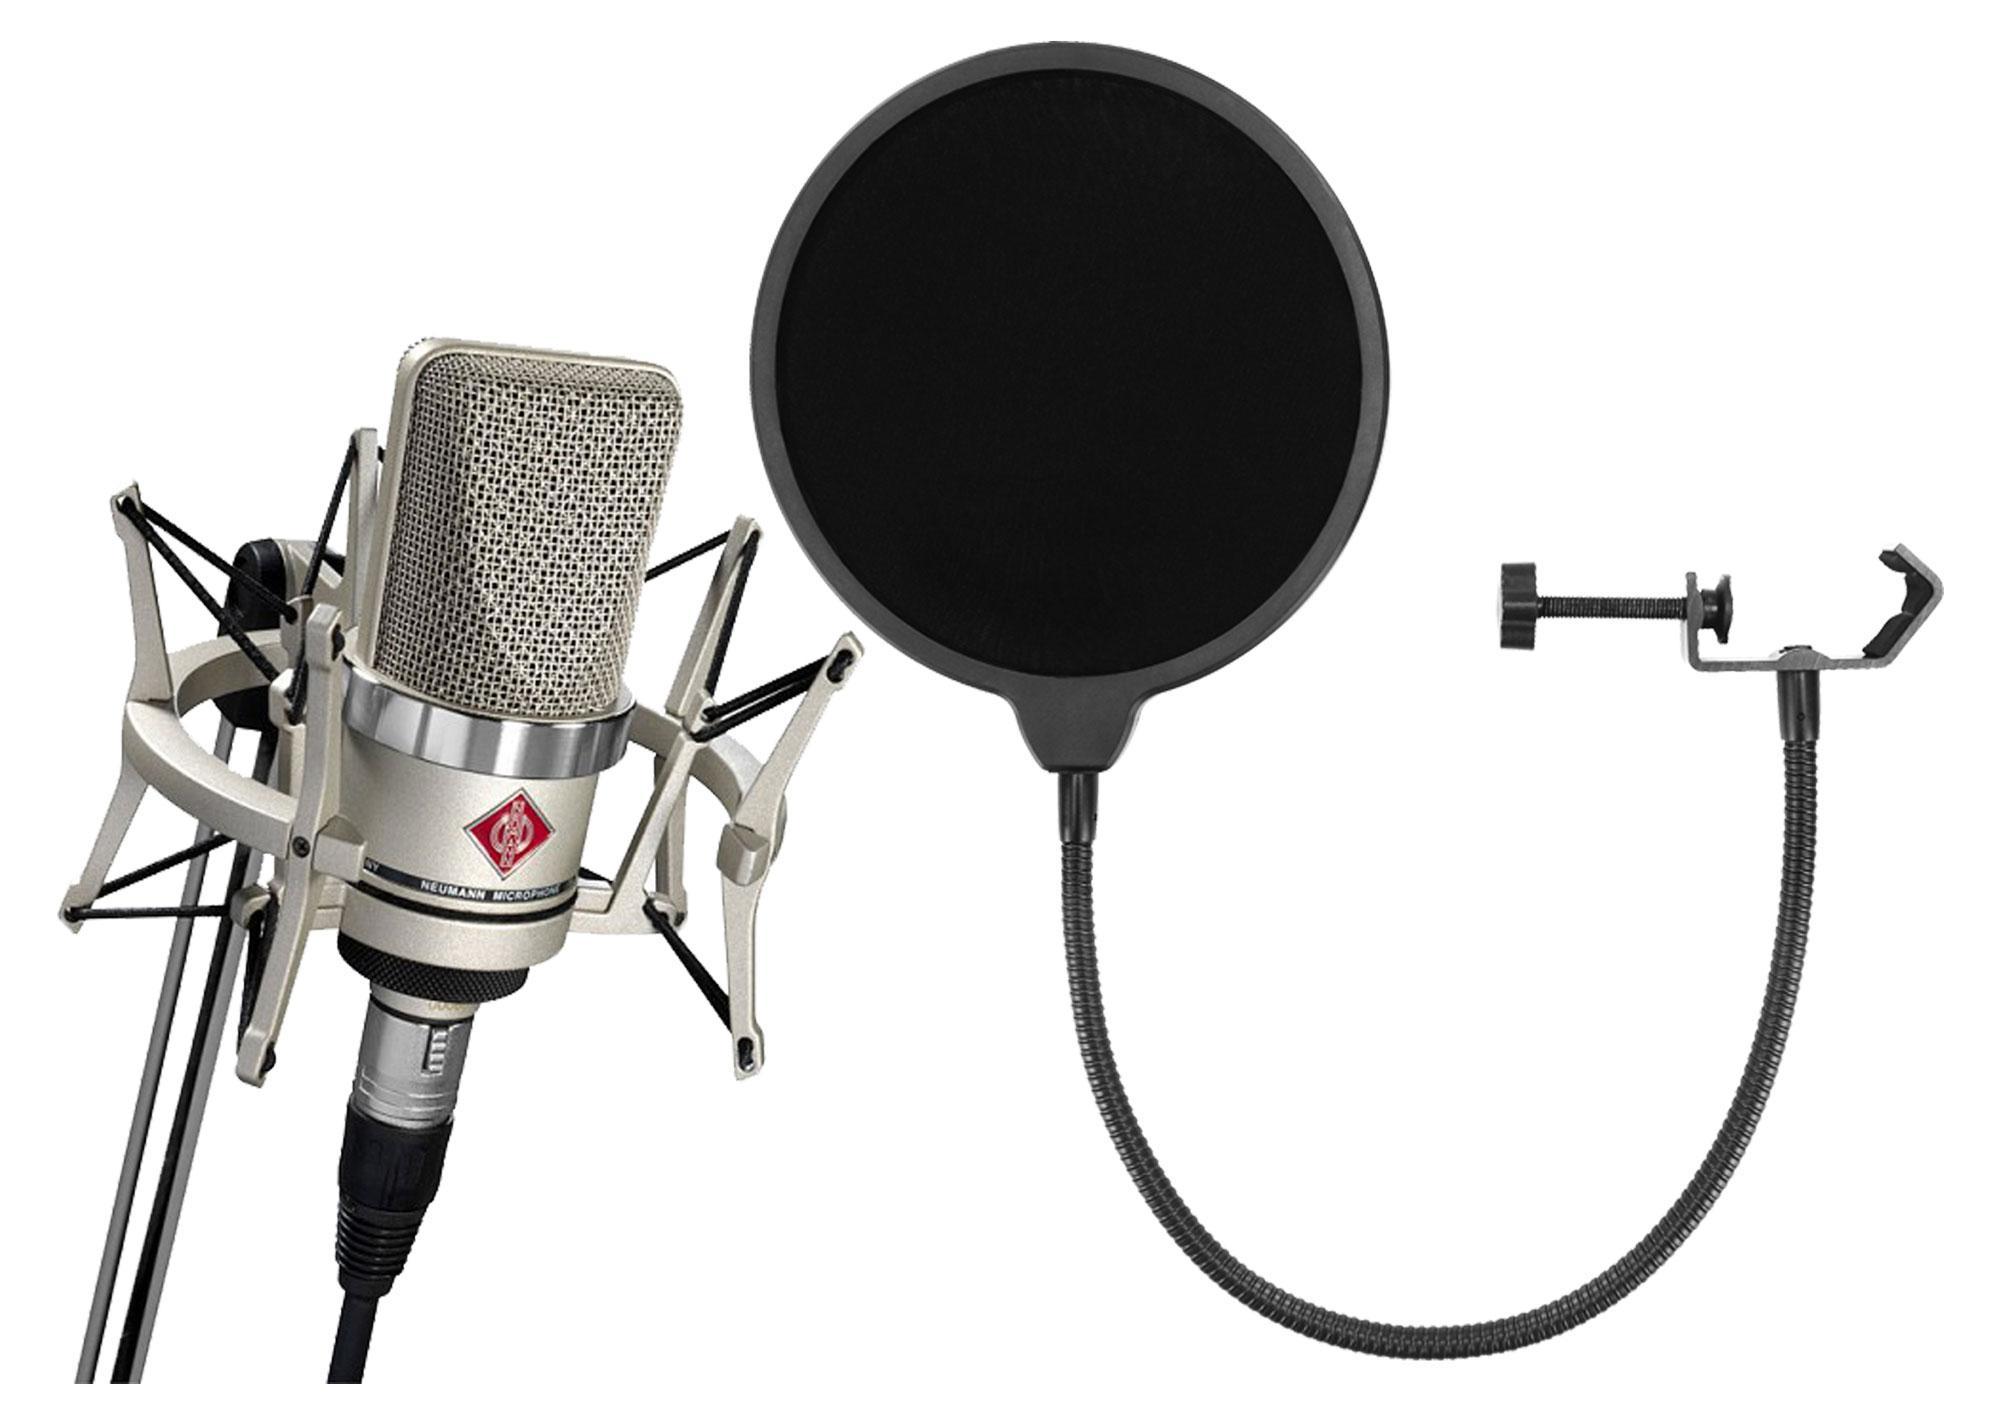 Mikrofone - Neumann TLM 102 NI Studio Mikrofon Set inkl. Popkiller - Onlineshop Musikhaus Kirstein